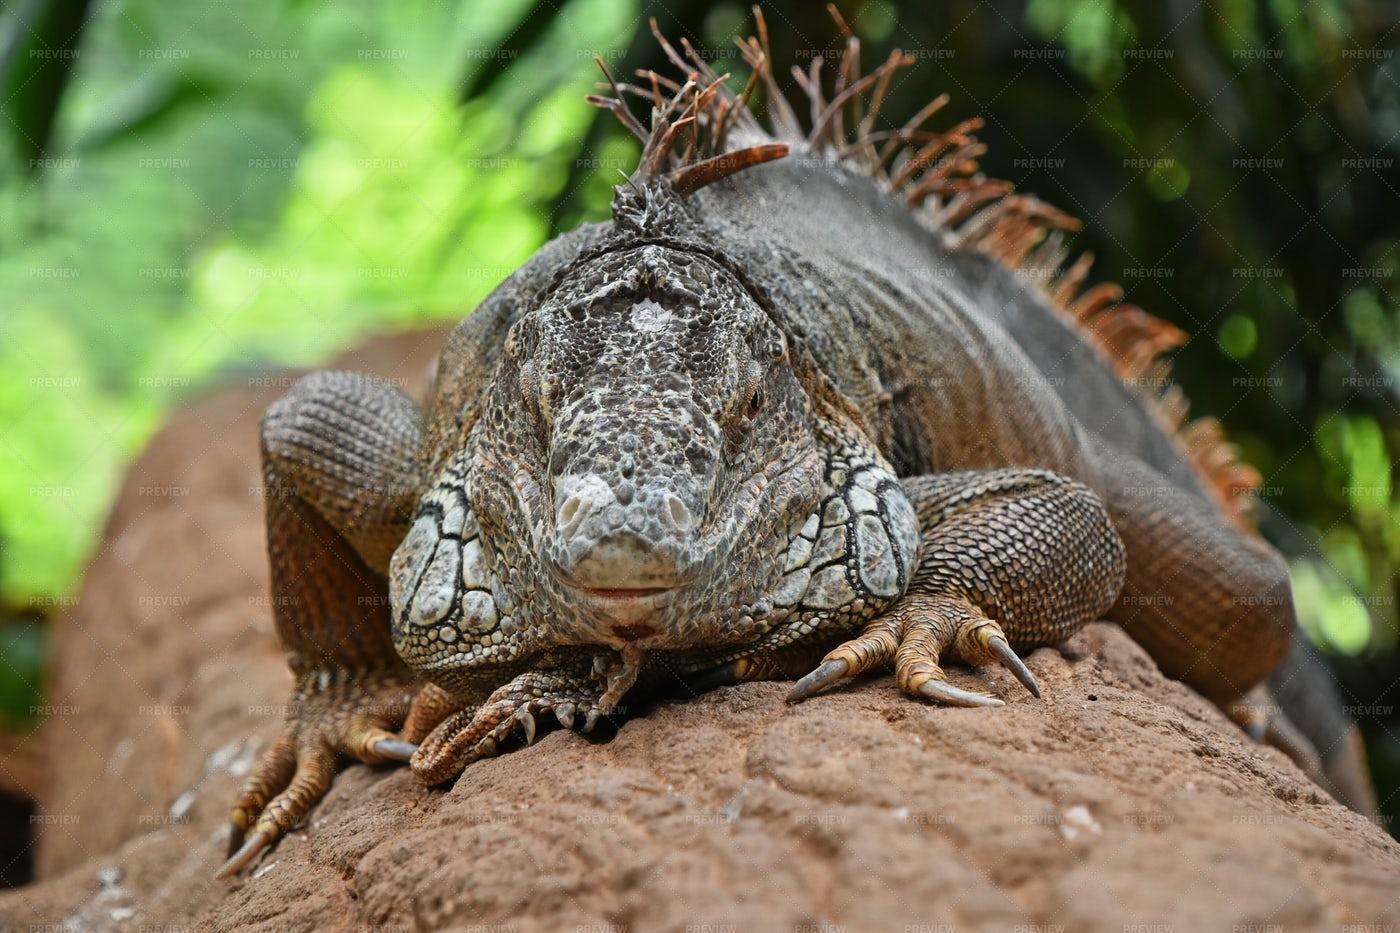 Iguana On A Tree Trunk: Stock Photos